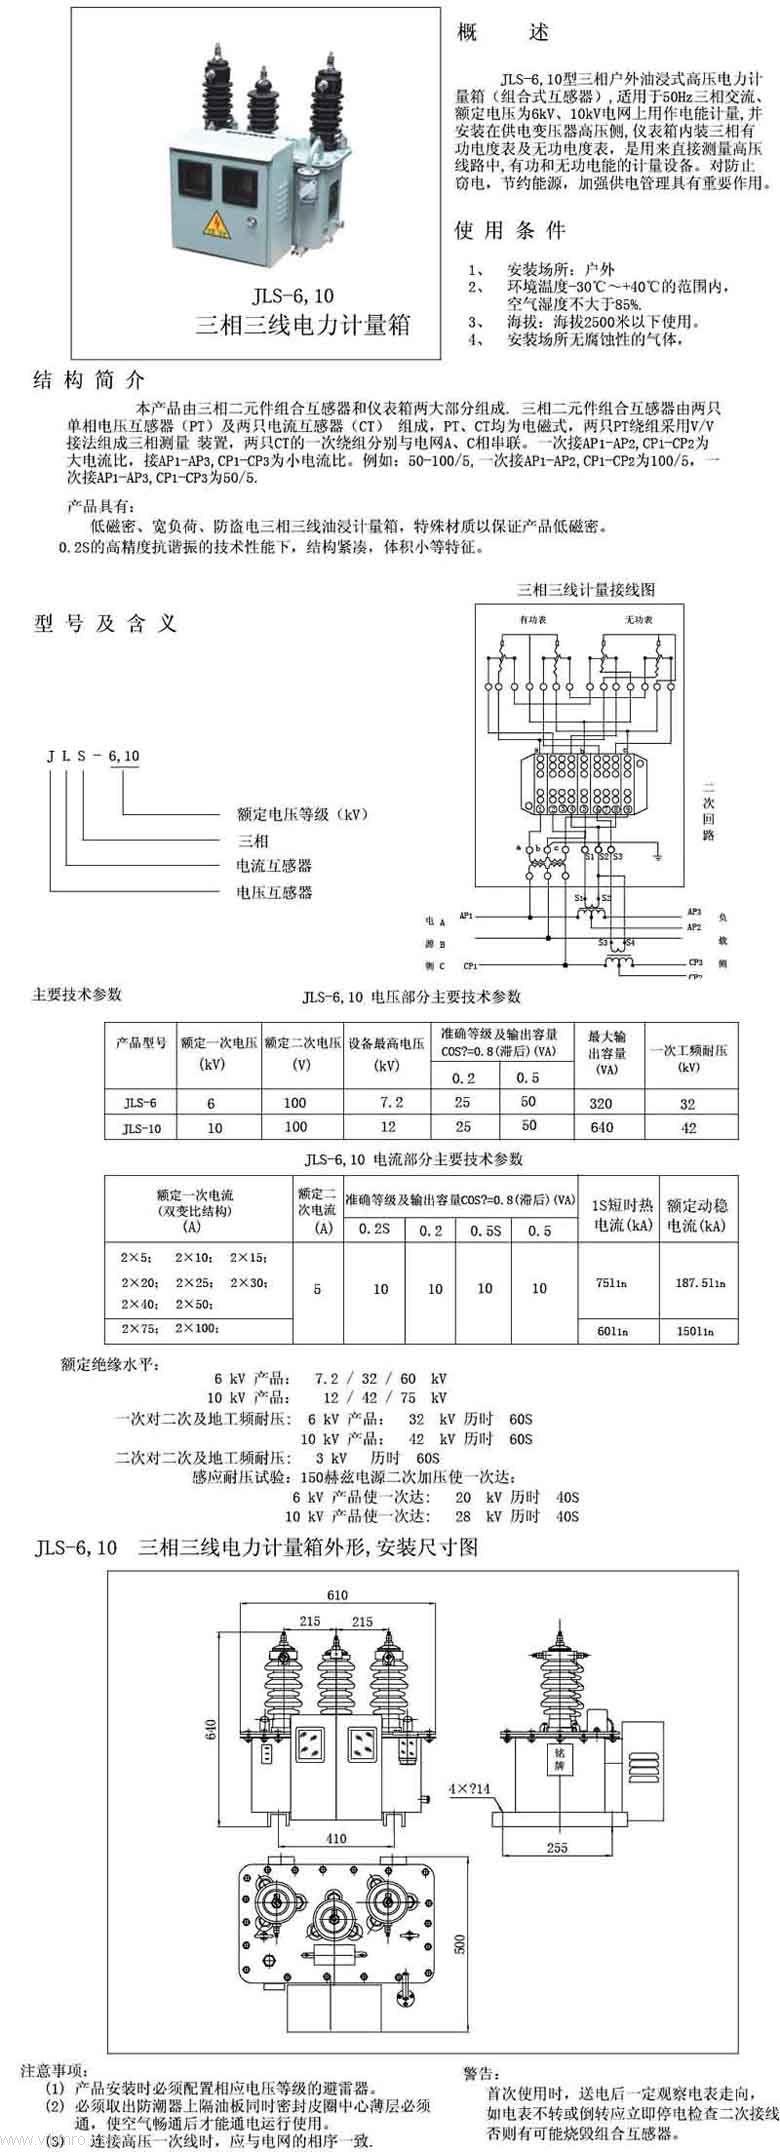 10kv-35kv系列高压计量箱